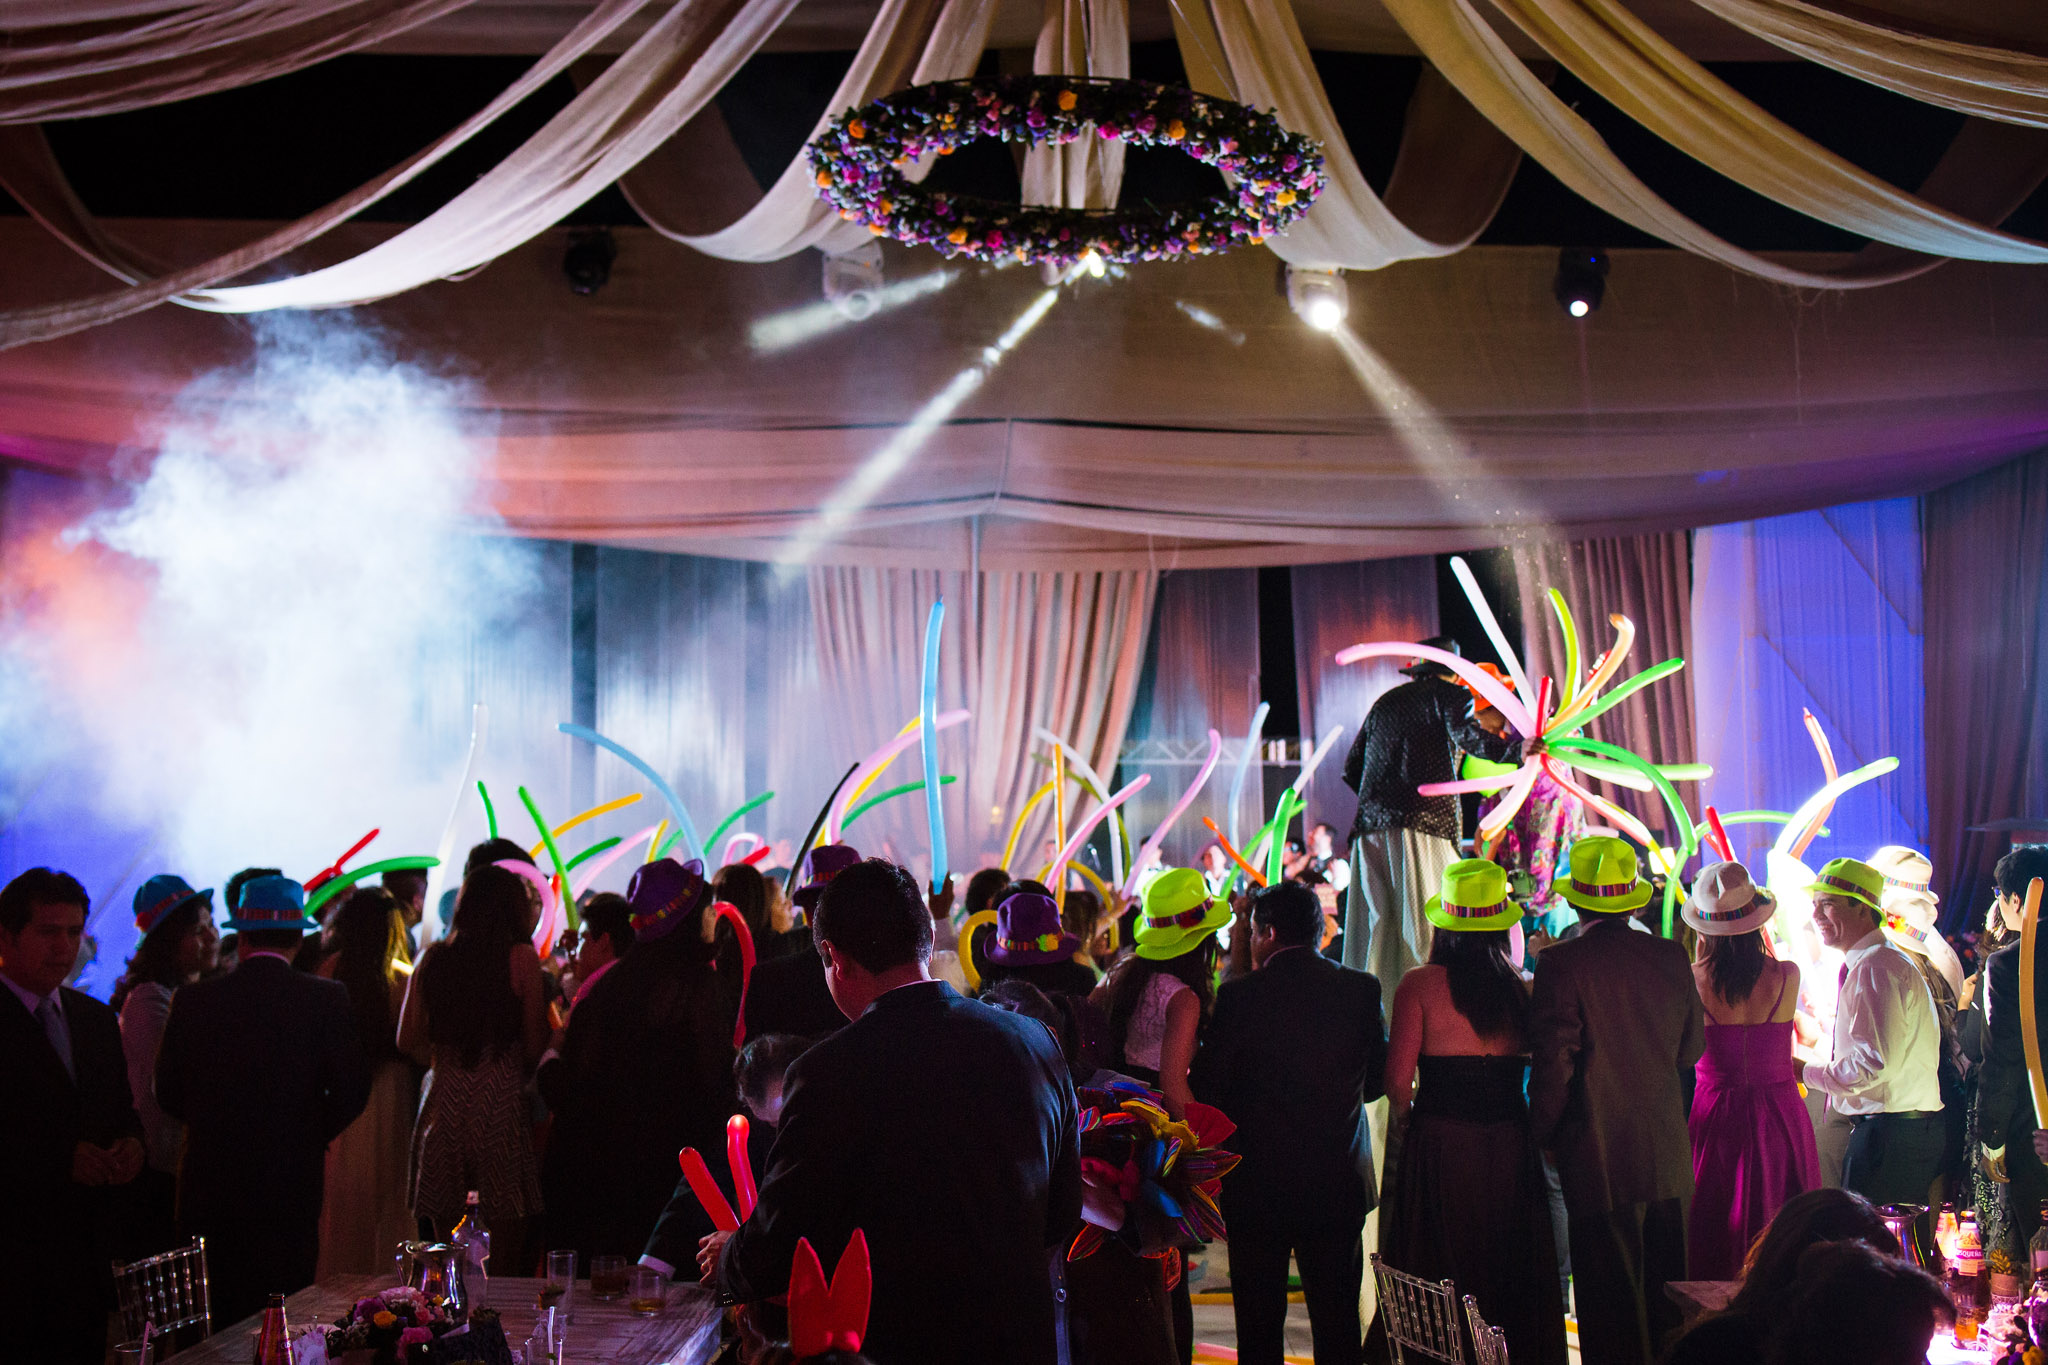 Wedding-Travellers-Destination-Wedding-Peru-Cusco-Hacienda-Sarapampa-Sacred-Valley-hora-loca-party